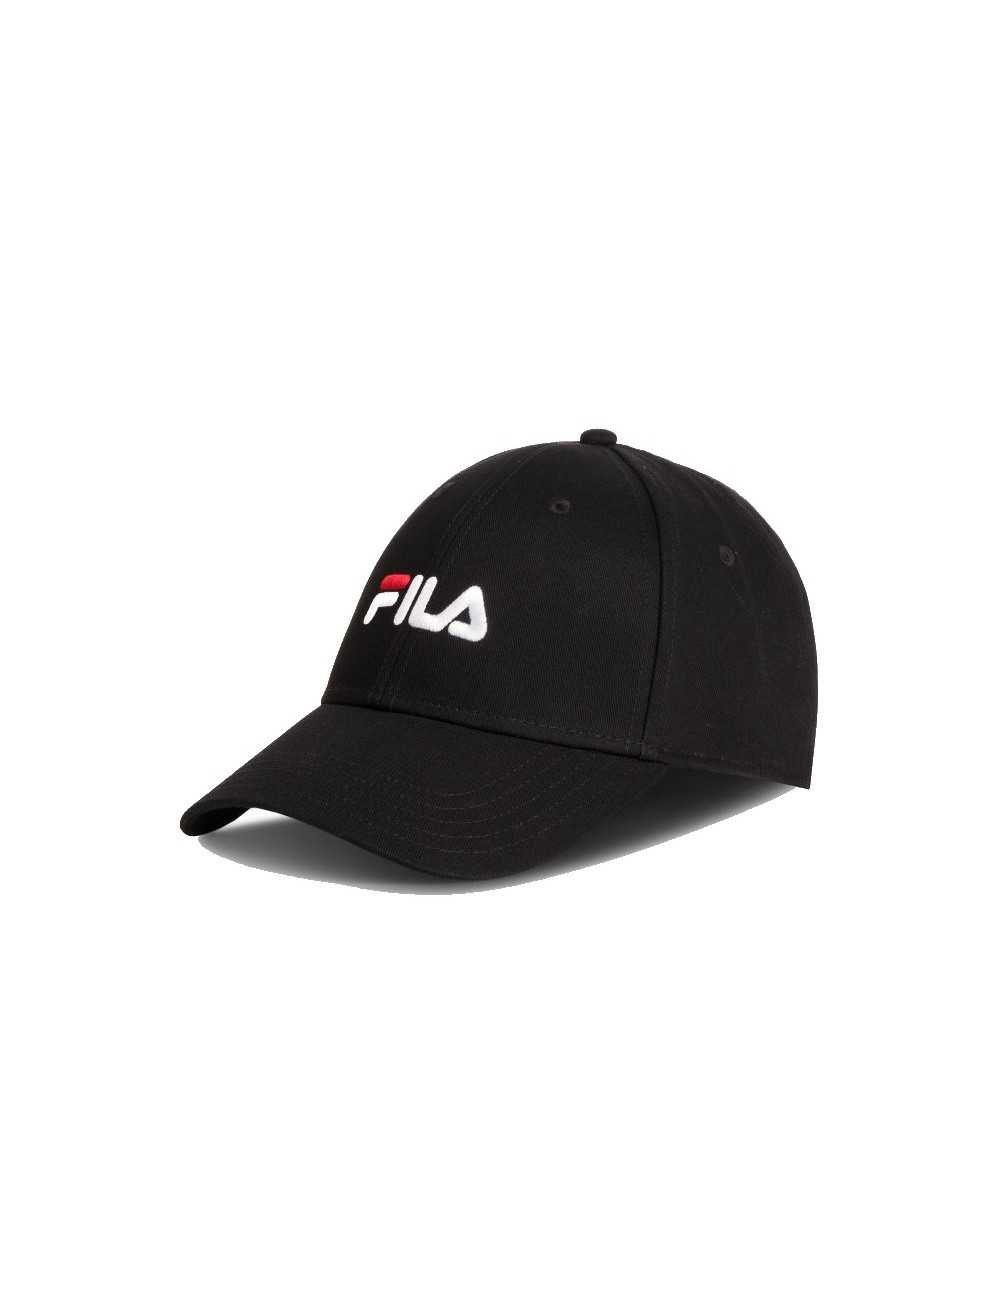 CAPPELLINO UNISEX FILA 6 PANEL CAP LINEAR LOGO